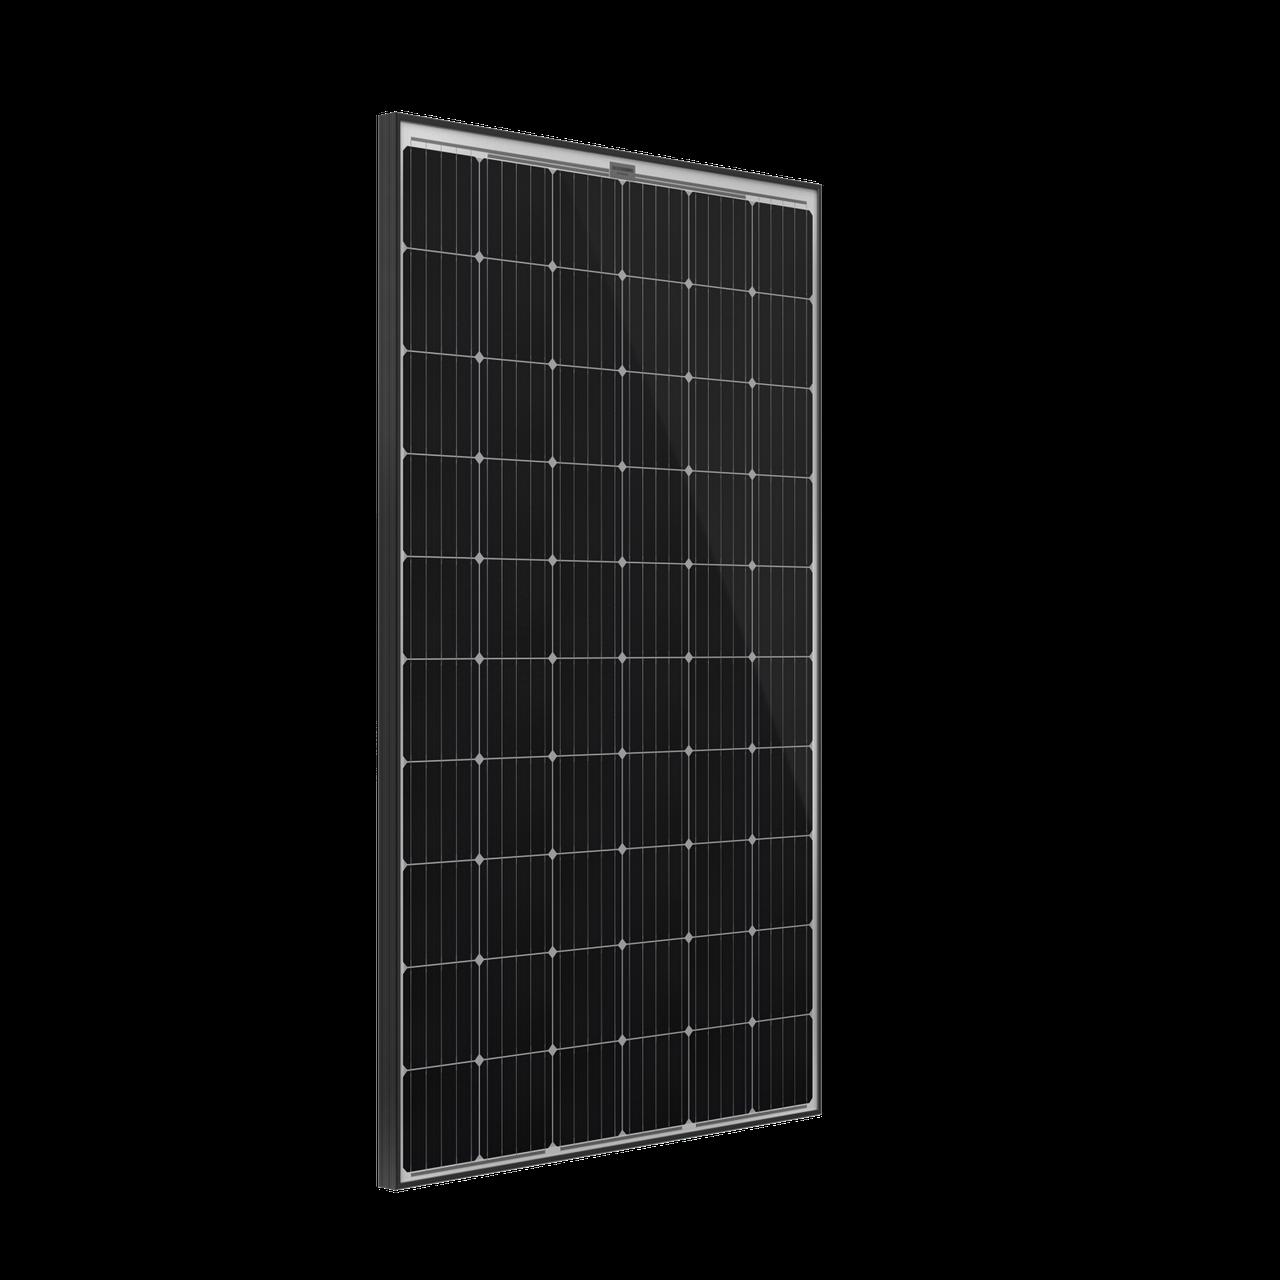 Солнечная батарея Leapton LP72-365M PERC 5BB, 365 Вт (монокристалл)